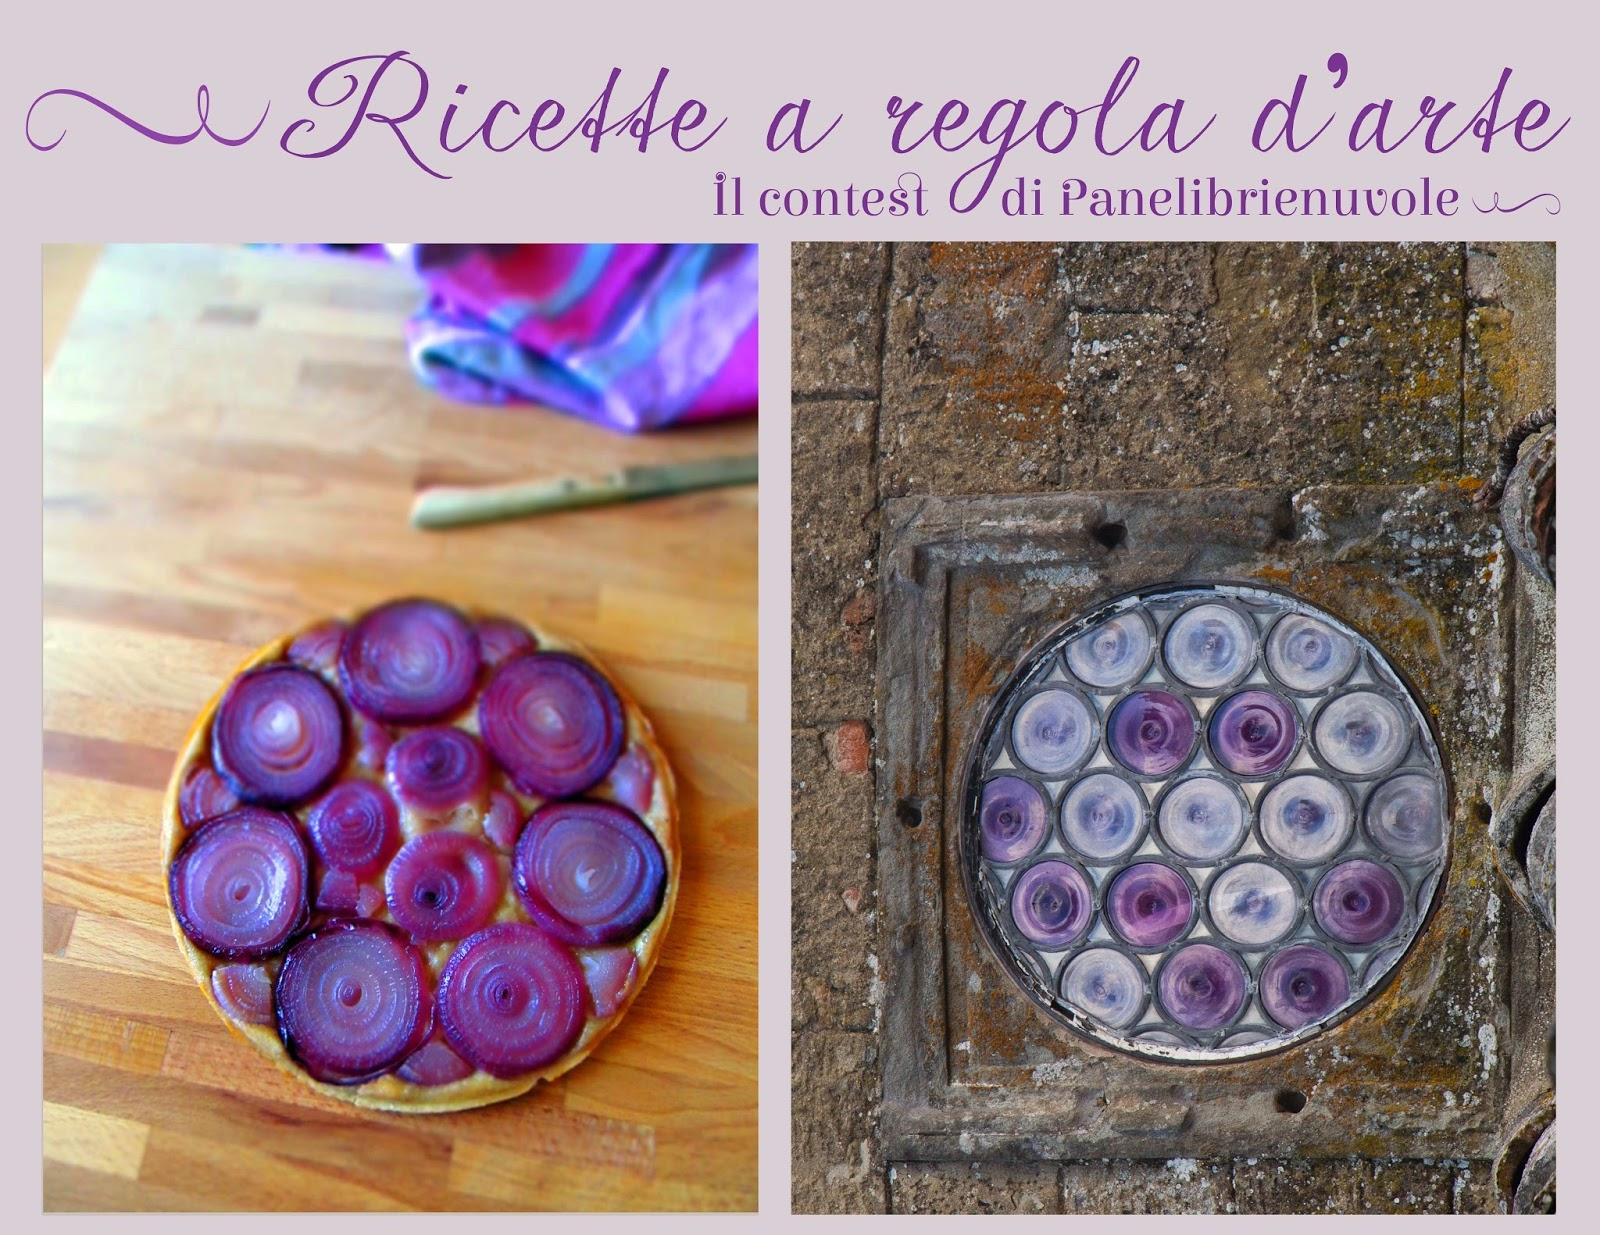 https://panelibrietnuvole.wordpress.com/2015/01/19/ricette-a-regola-darte-il-contest-di-panelibrienuvole/